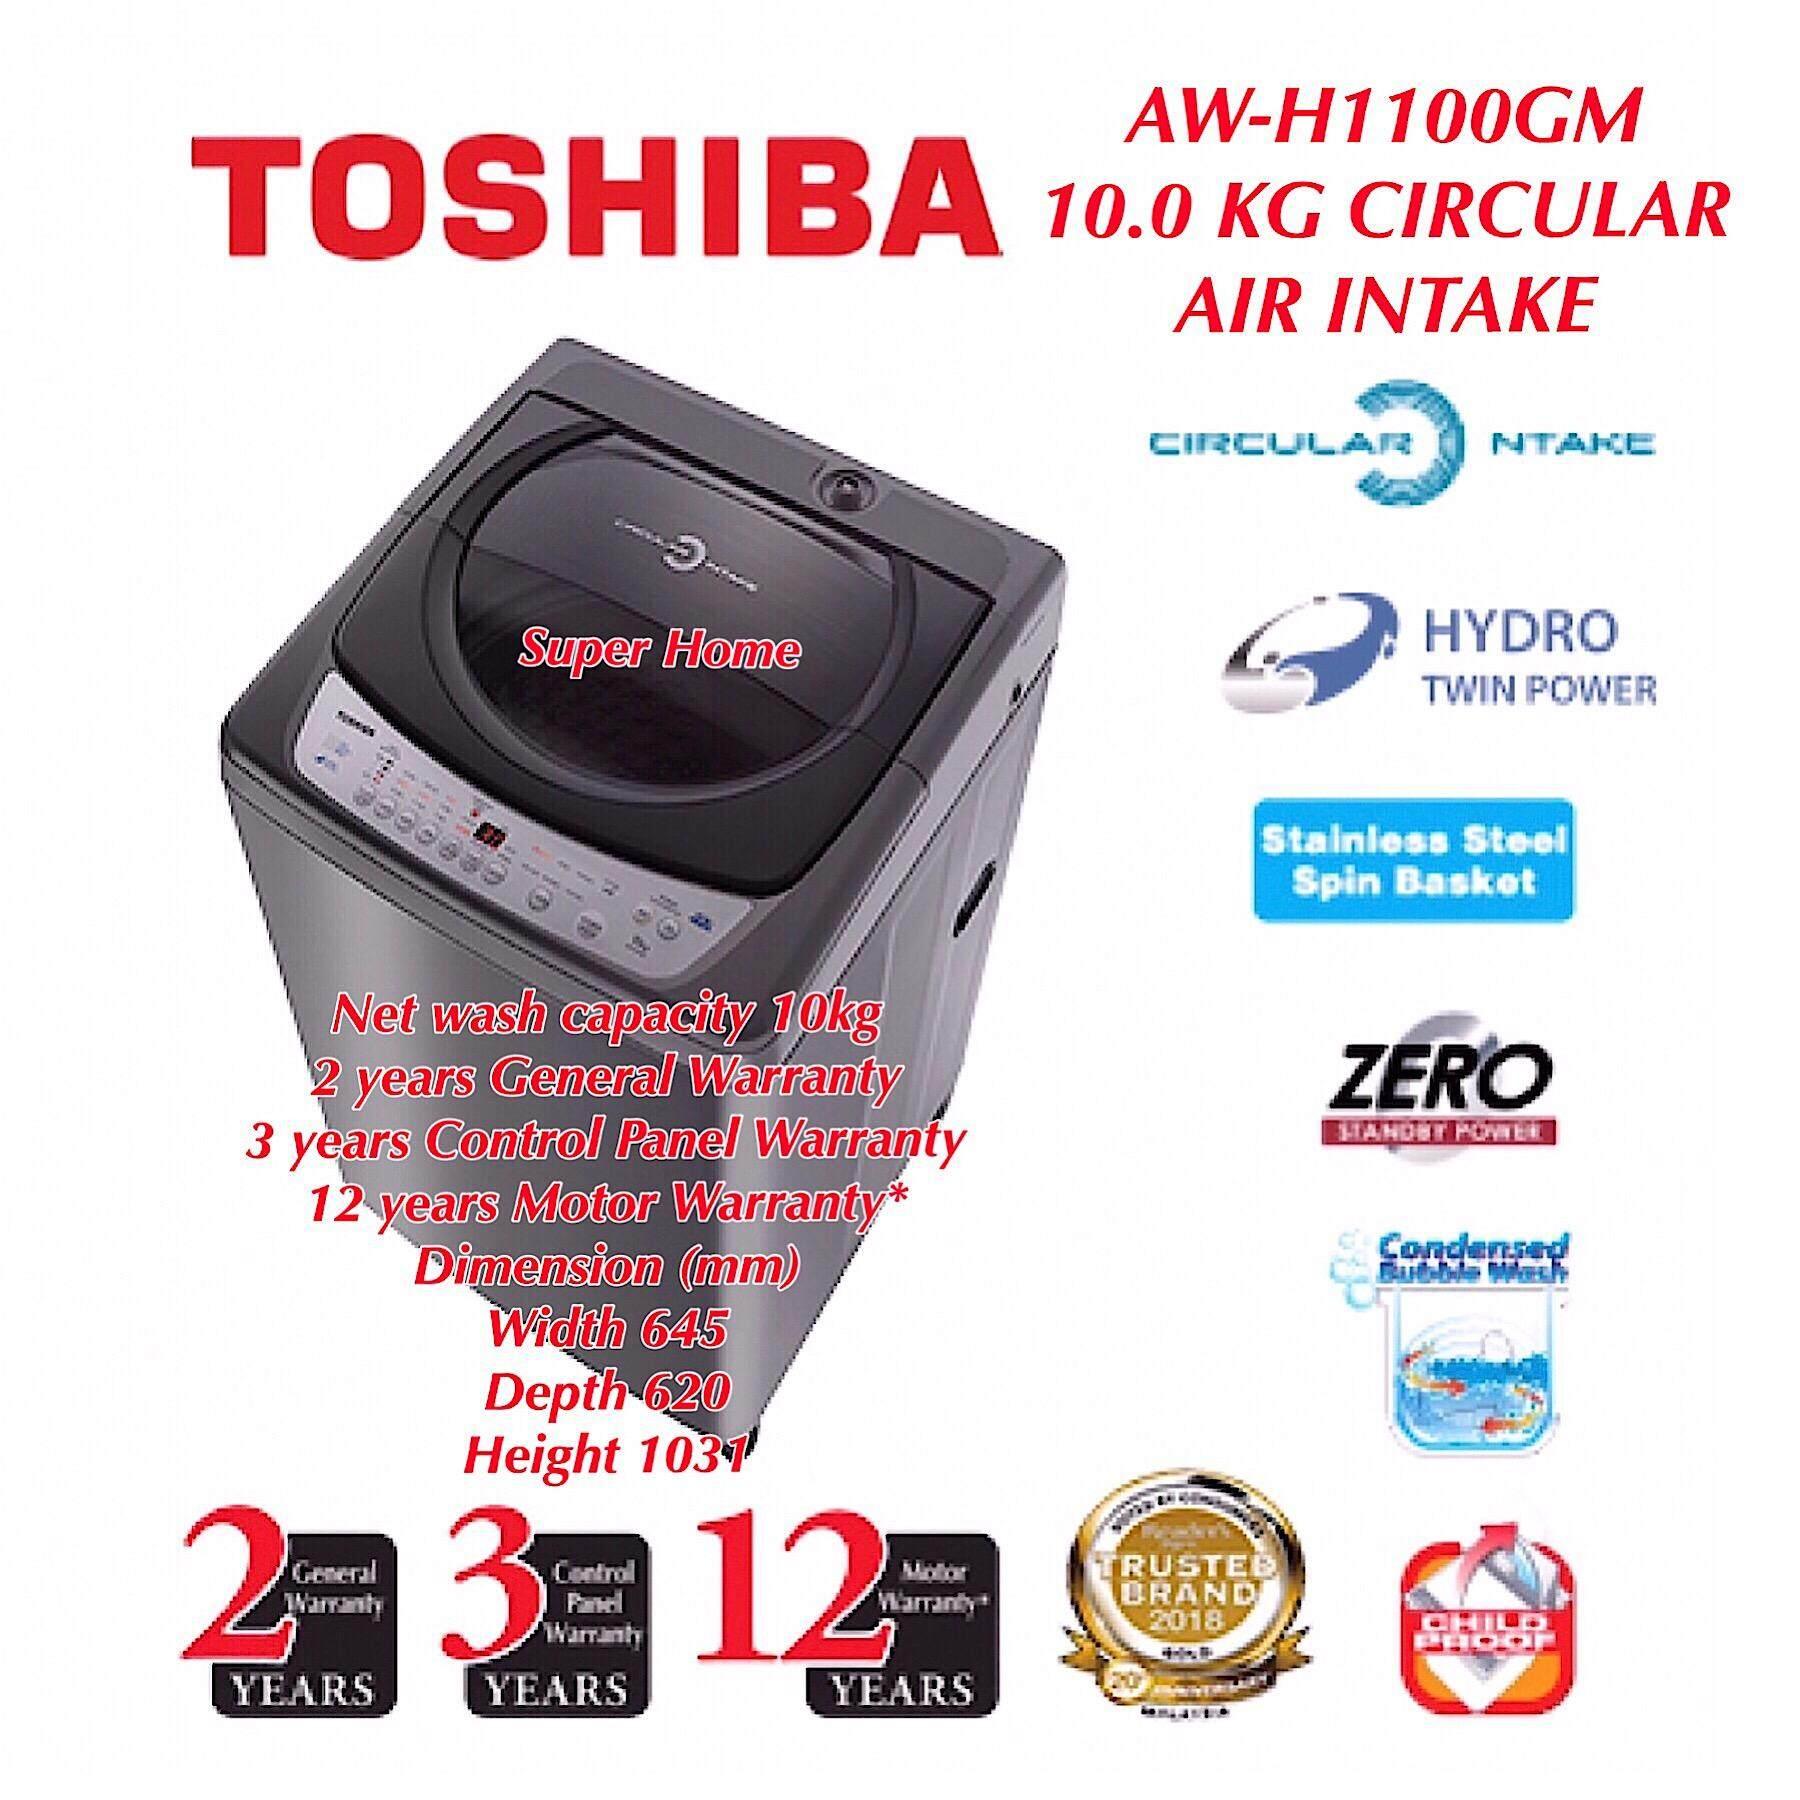 Toshiba AW-H1100GM Circular Air Intake Top Load Washing Machine 10.0kg - Zero Standby Power